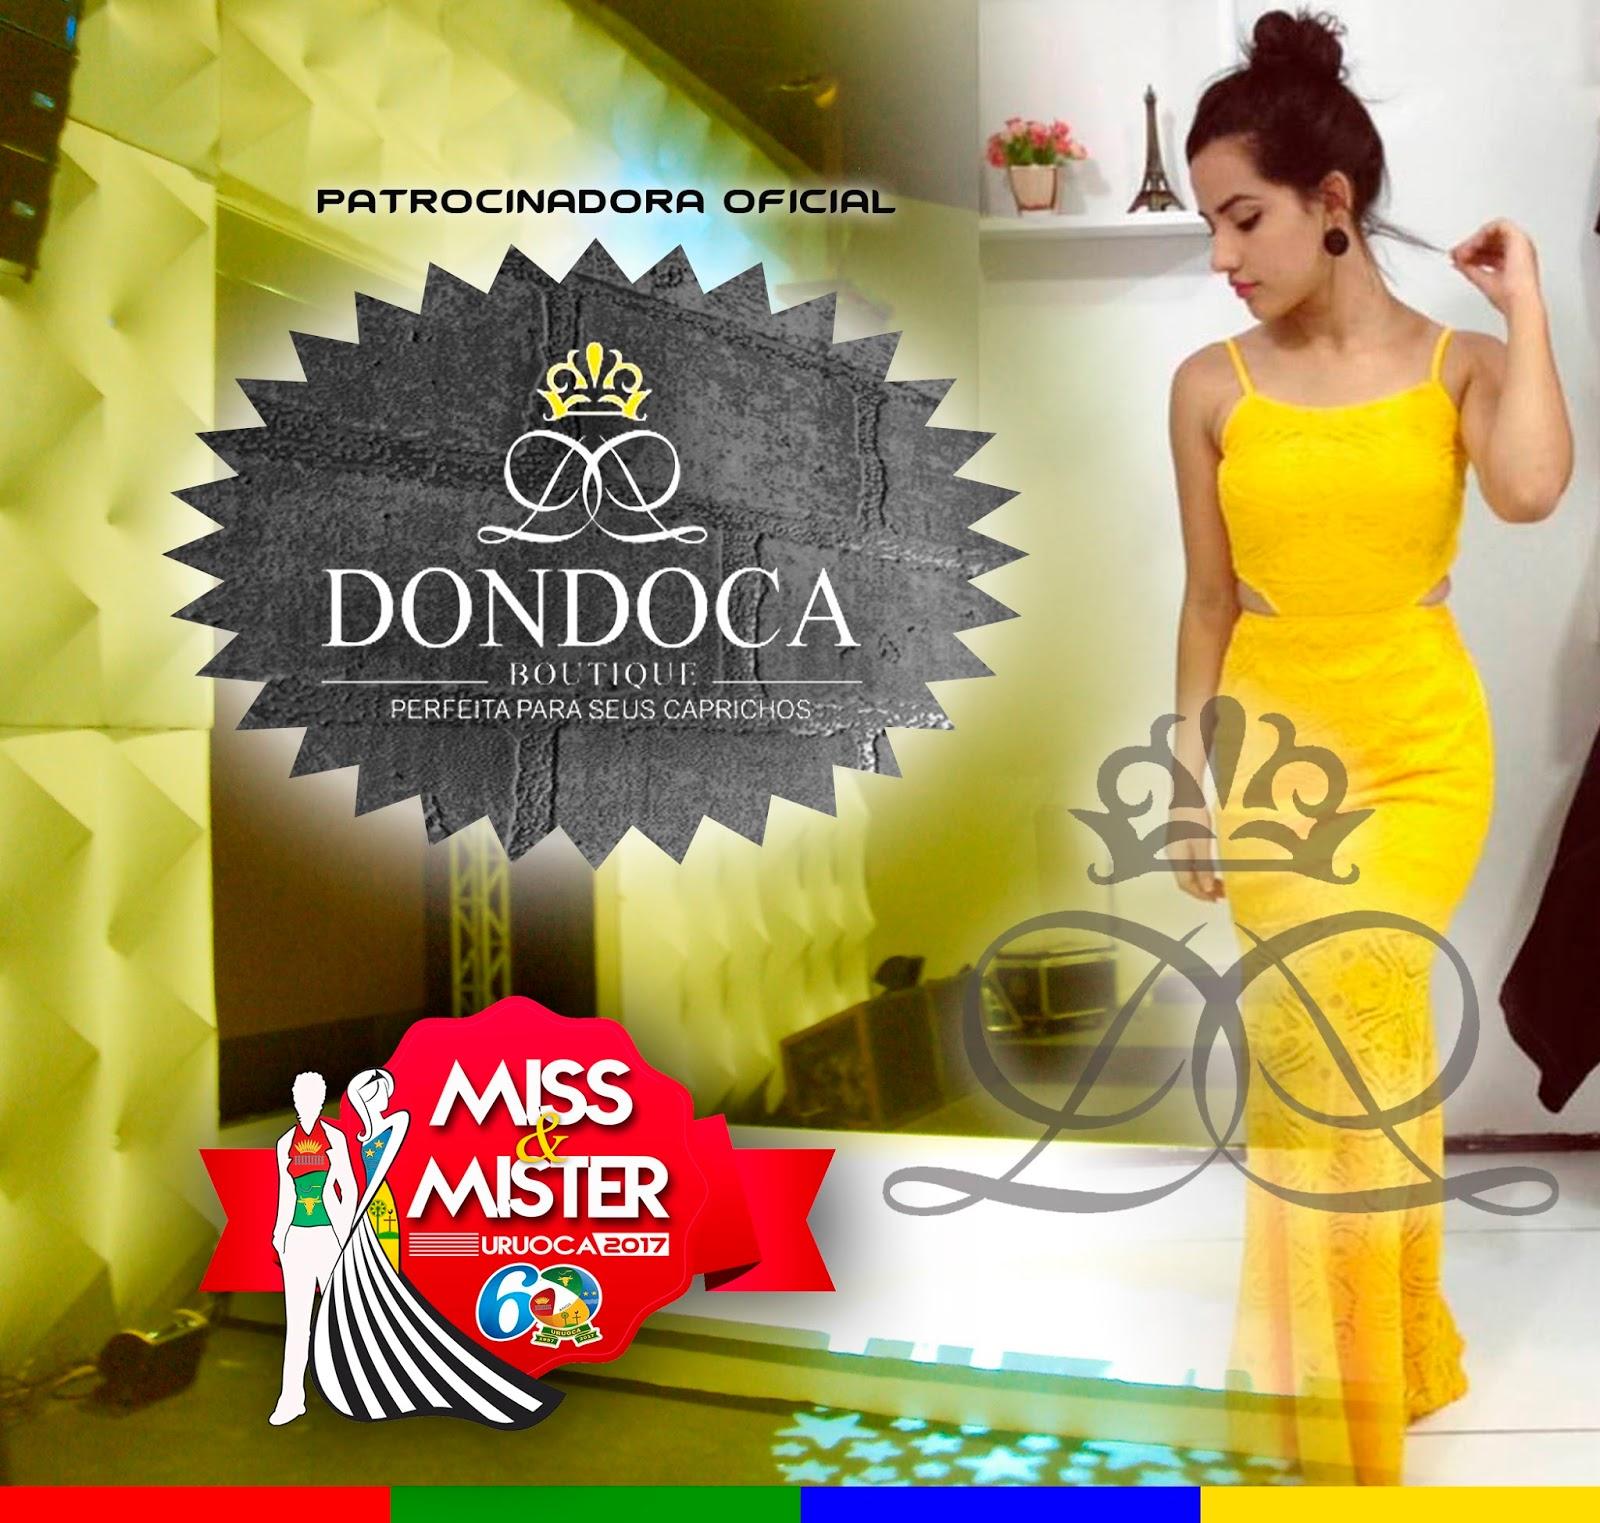 6ecd4c312 CONCURSO MISS E MISTER URUOCA 2017: DONDOCA BOUTIQUE SERÁ A PATROCINADORA  OFICIAL DO EVENTO